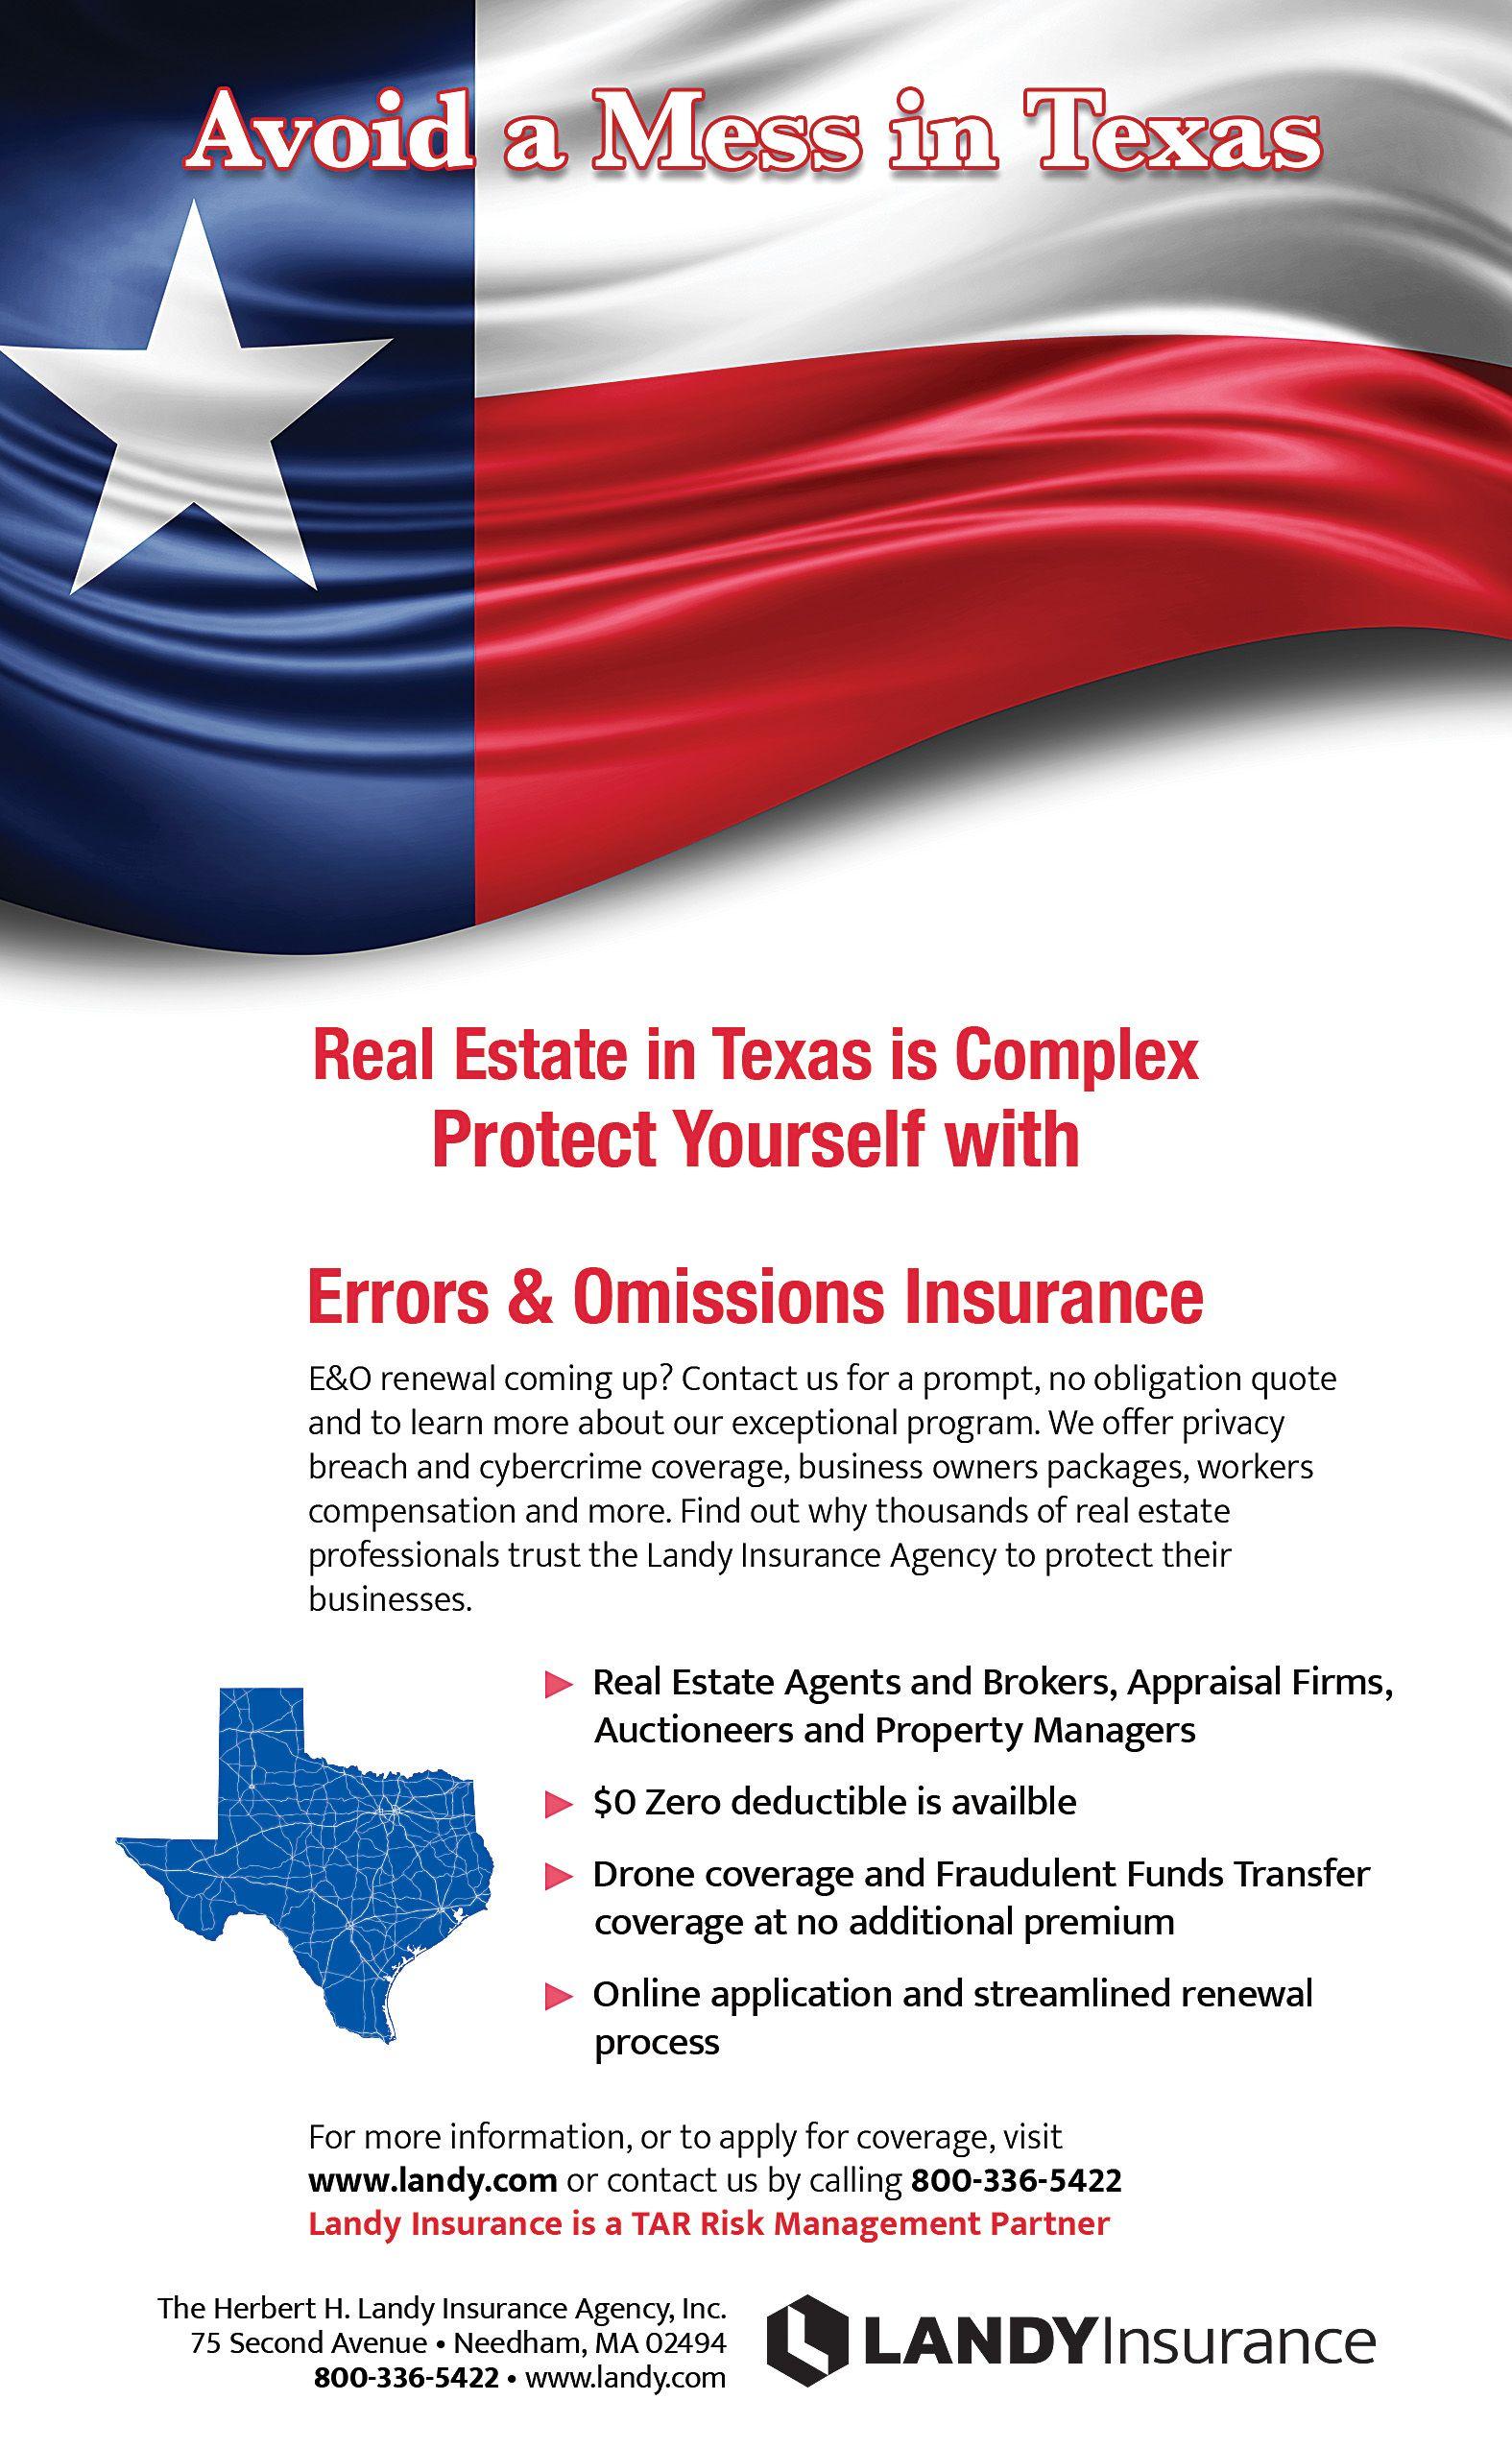 Avoid A Mess In Texas Texas Association of Realtors® Ad